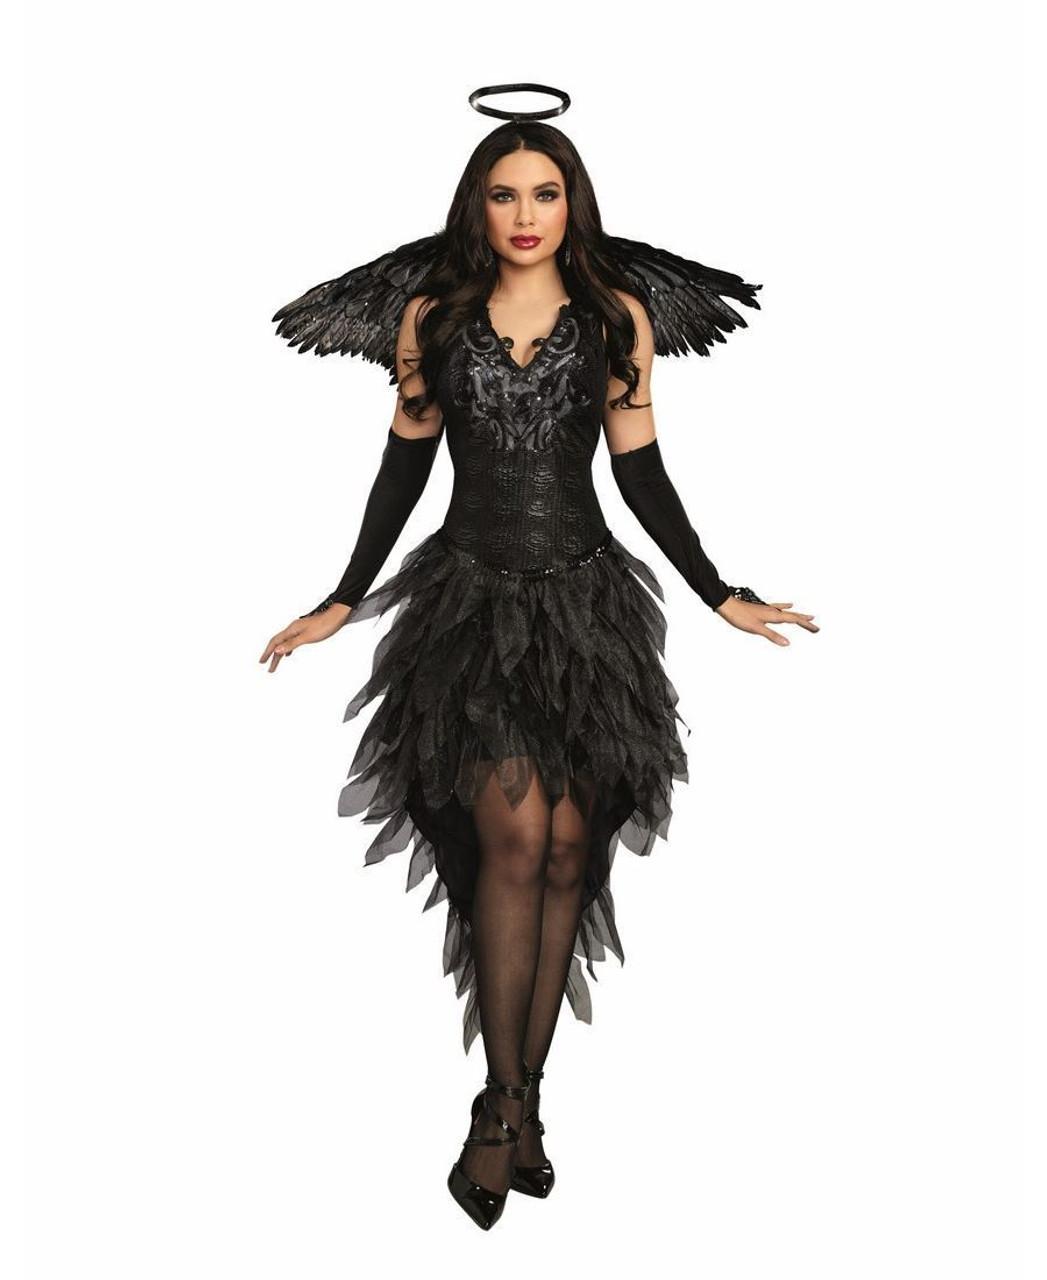 dbea75f5749f Dreamgirl Angel of Darkness Sexy Goth Dress Adult Womens Halloween Costume  11180